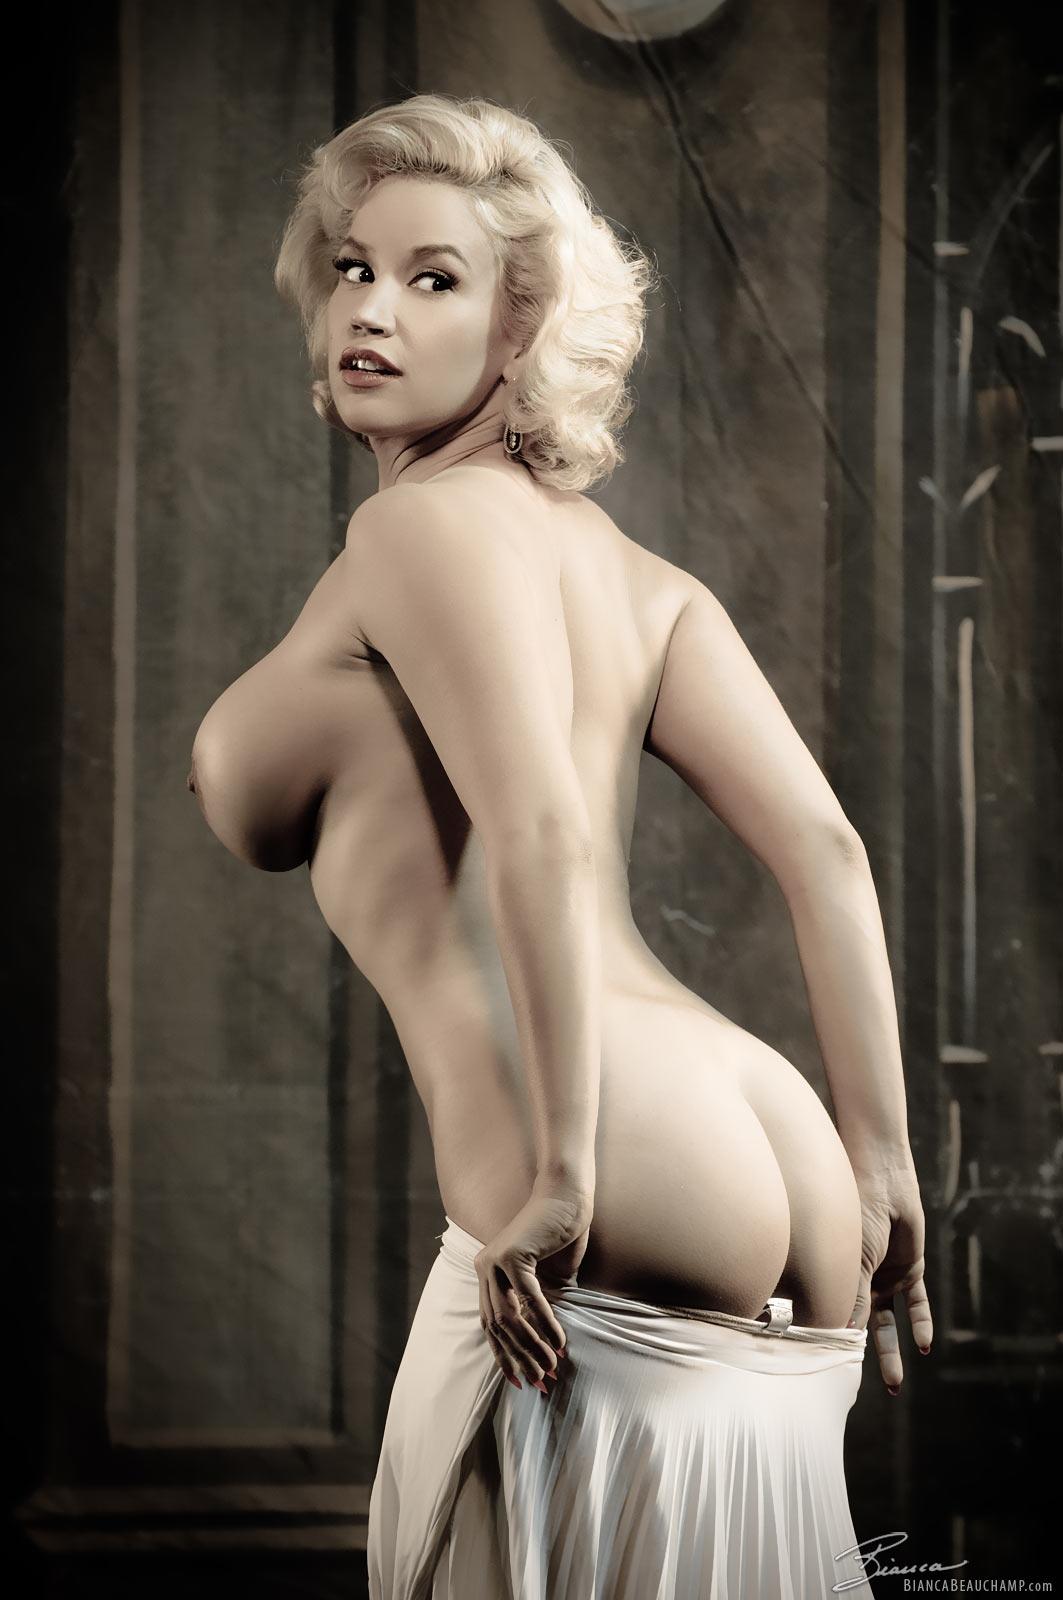 Ретро порно актриса похожая на мерлин монро 4 фотография